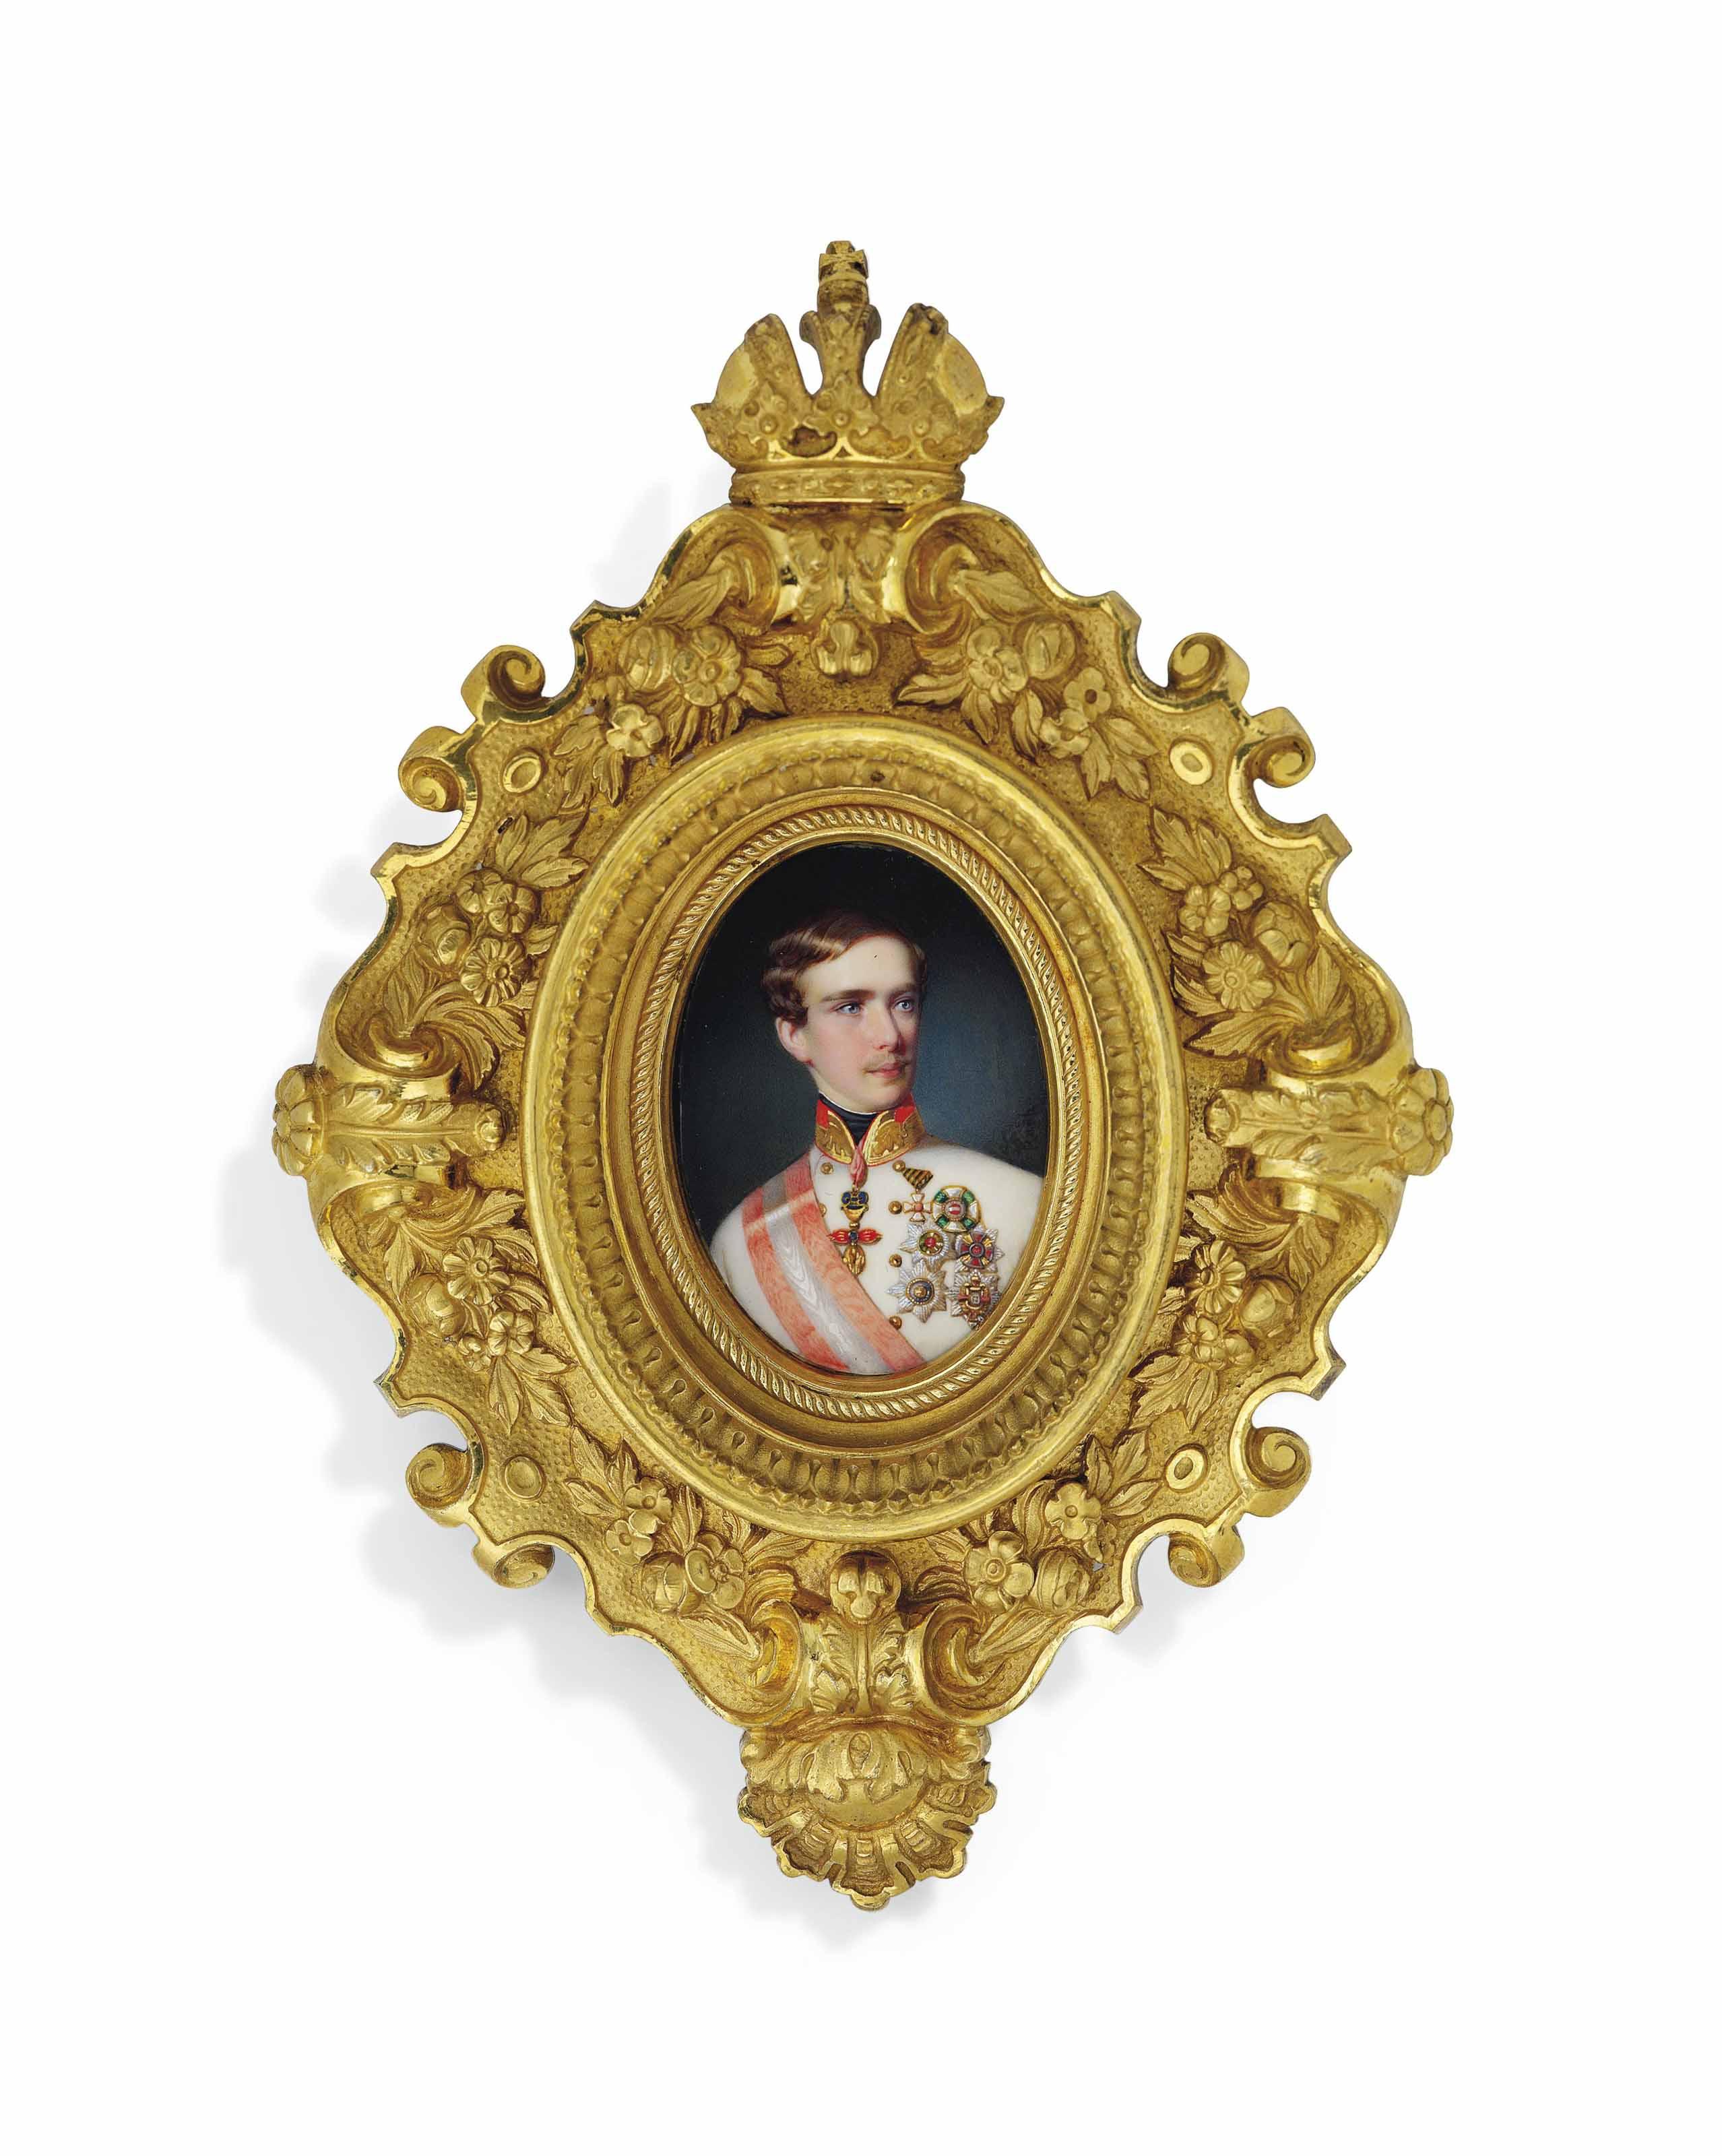 GEORG RAAB (AUSTRIAN, 1821-188